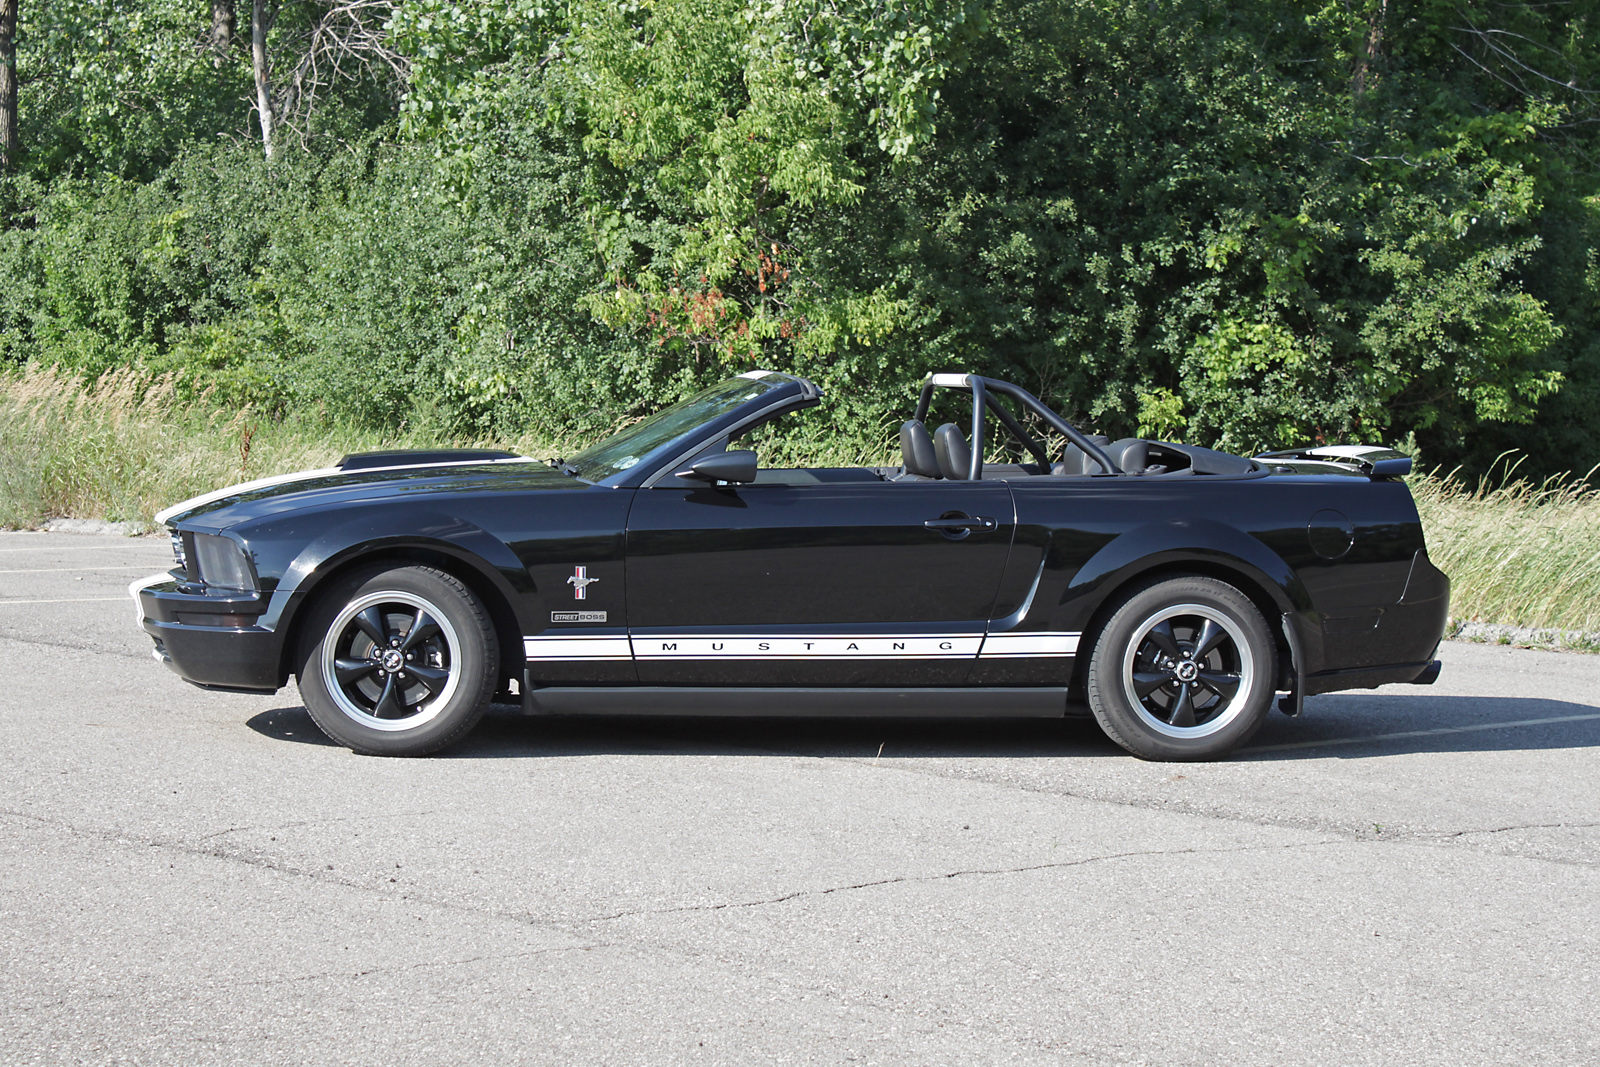 Click image for larger version  Name:Jim Carolan Mustang 5a.jpg Views:77 Size:1.19 MB ID:35810